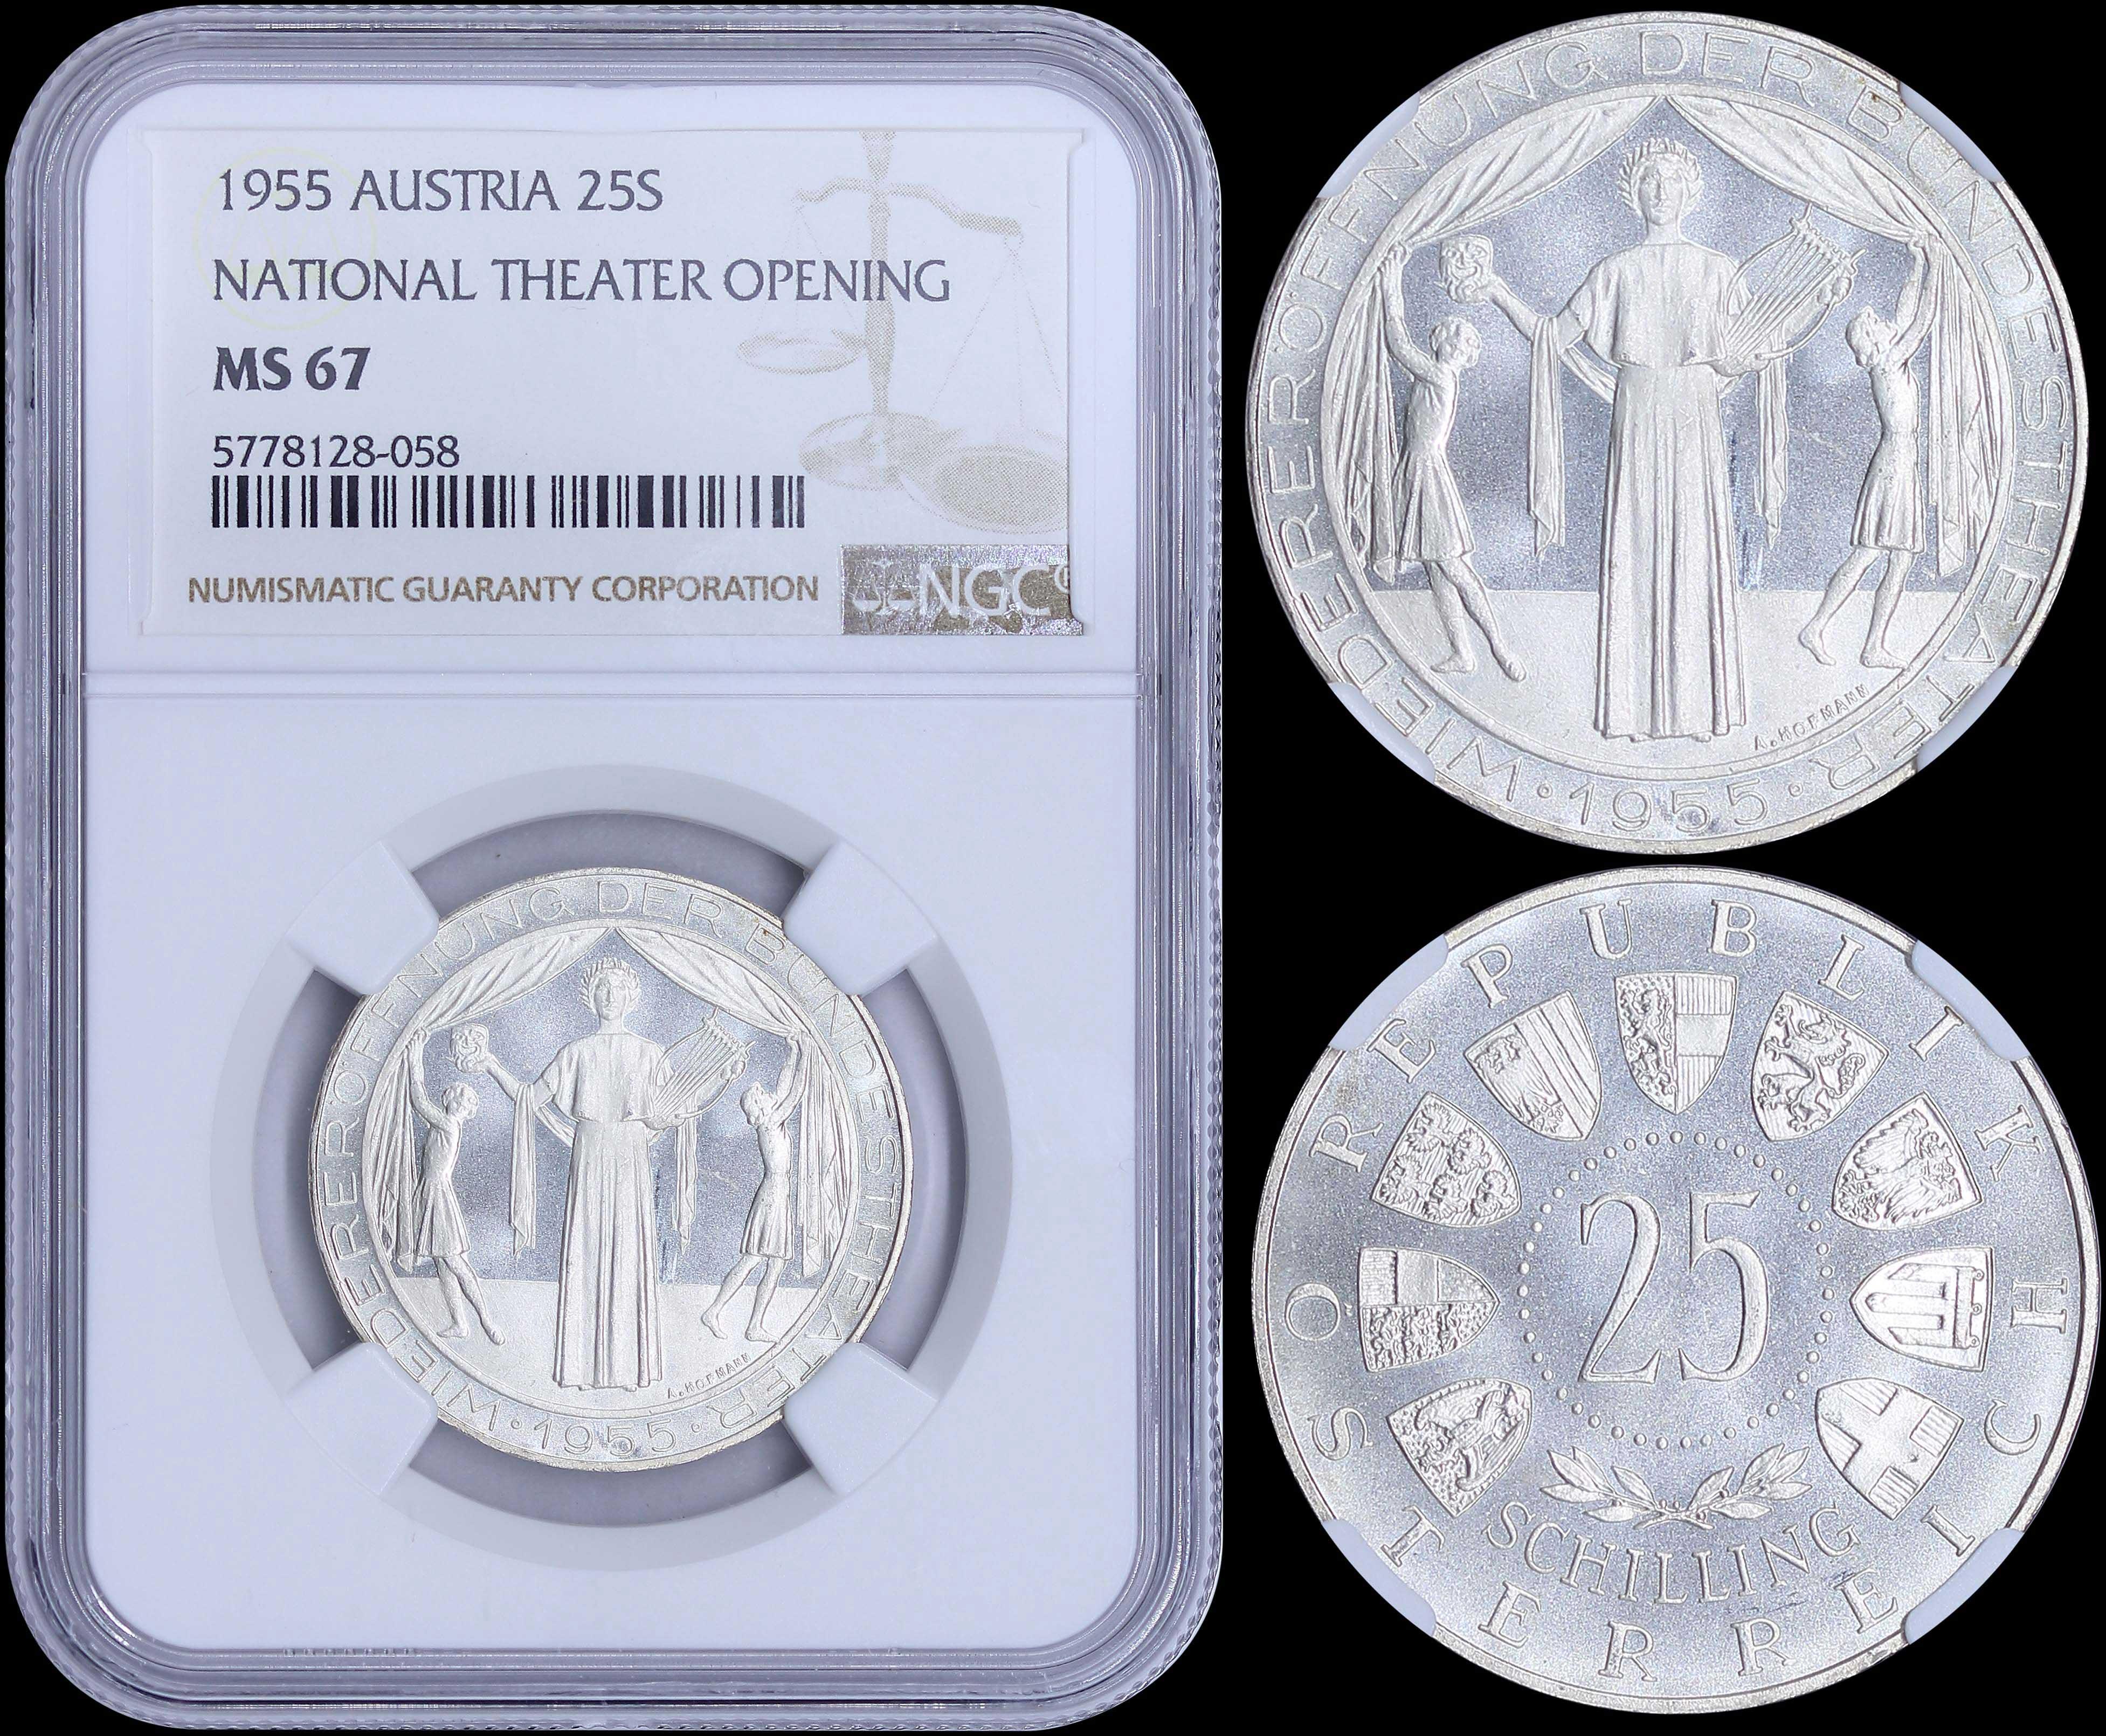 Lot 6787 - -  COINS & TOKENS COINS & TOKENS OF EUROPEAN COUNTRIES -  A. Karamitsos Postal & Live Internet Auction 984 (Part B)